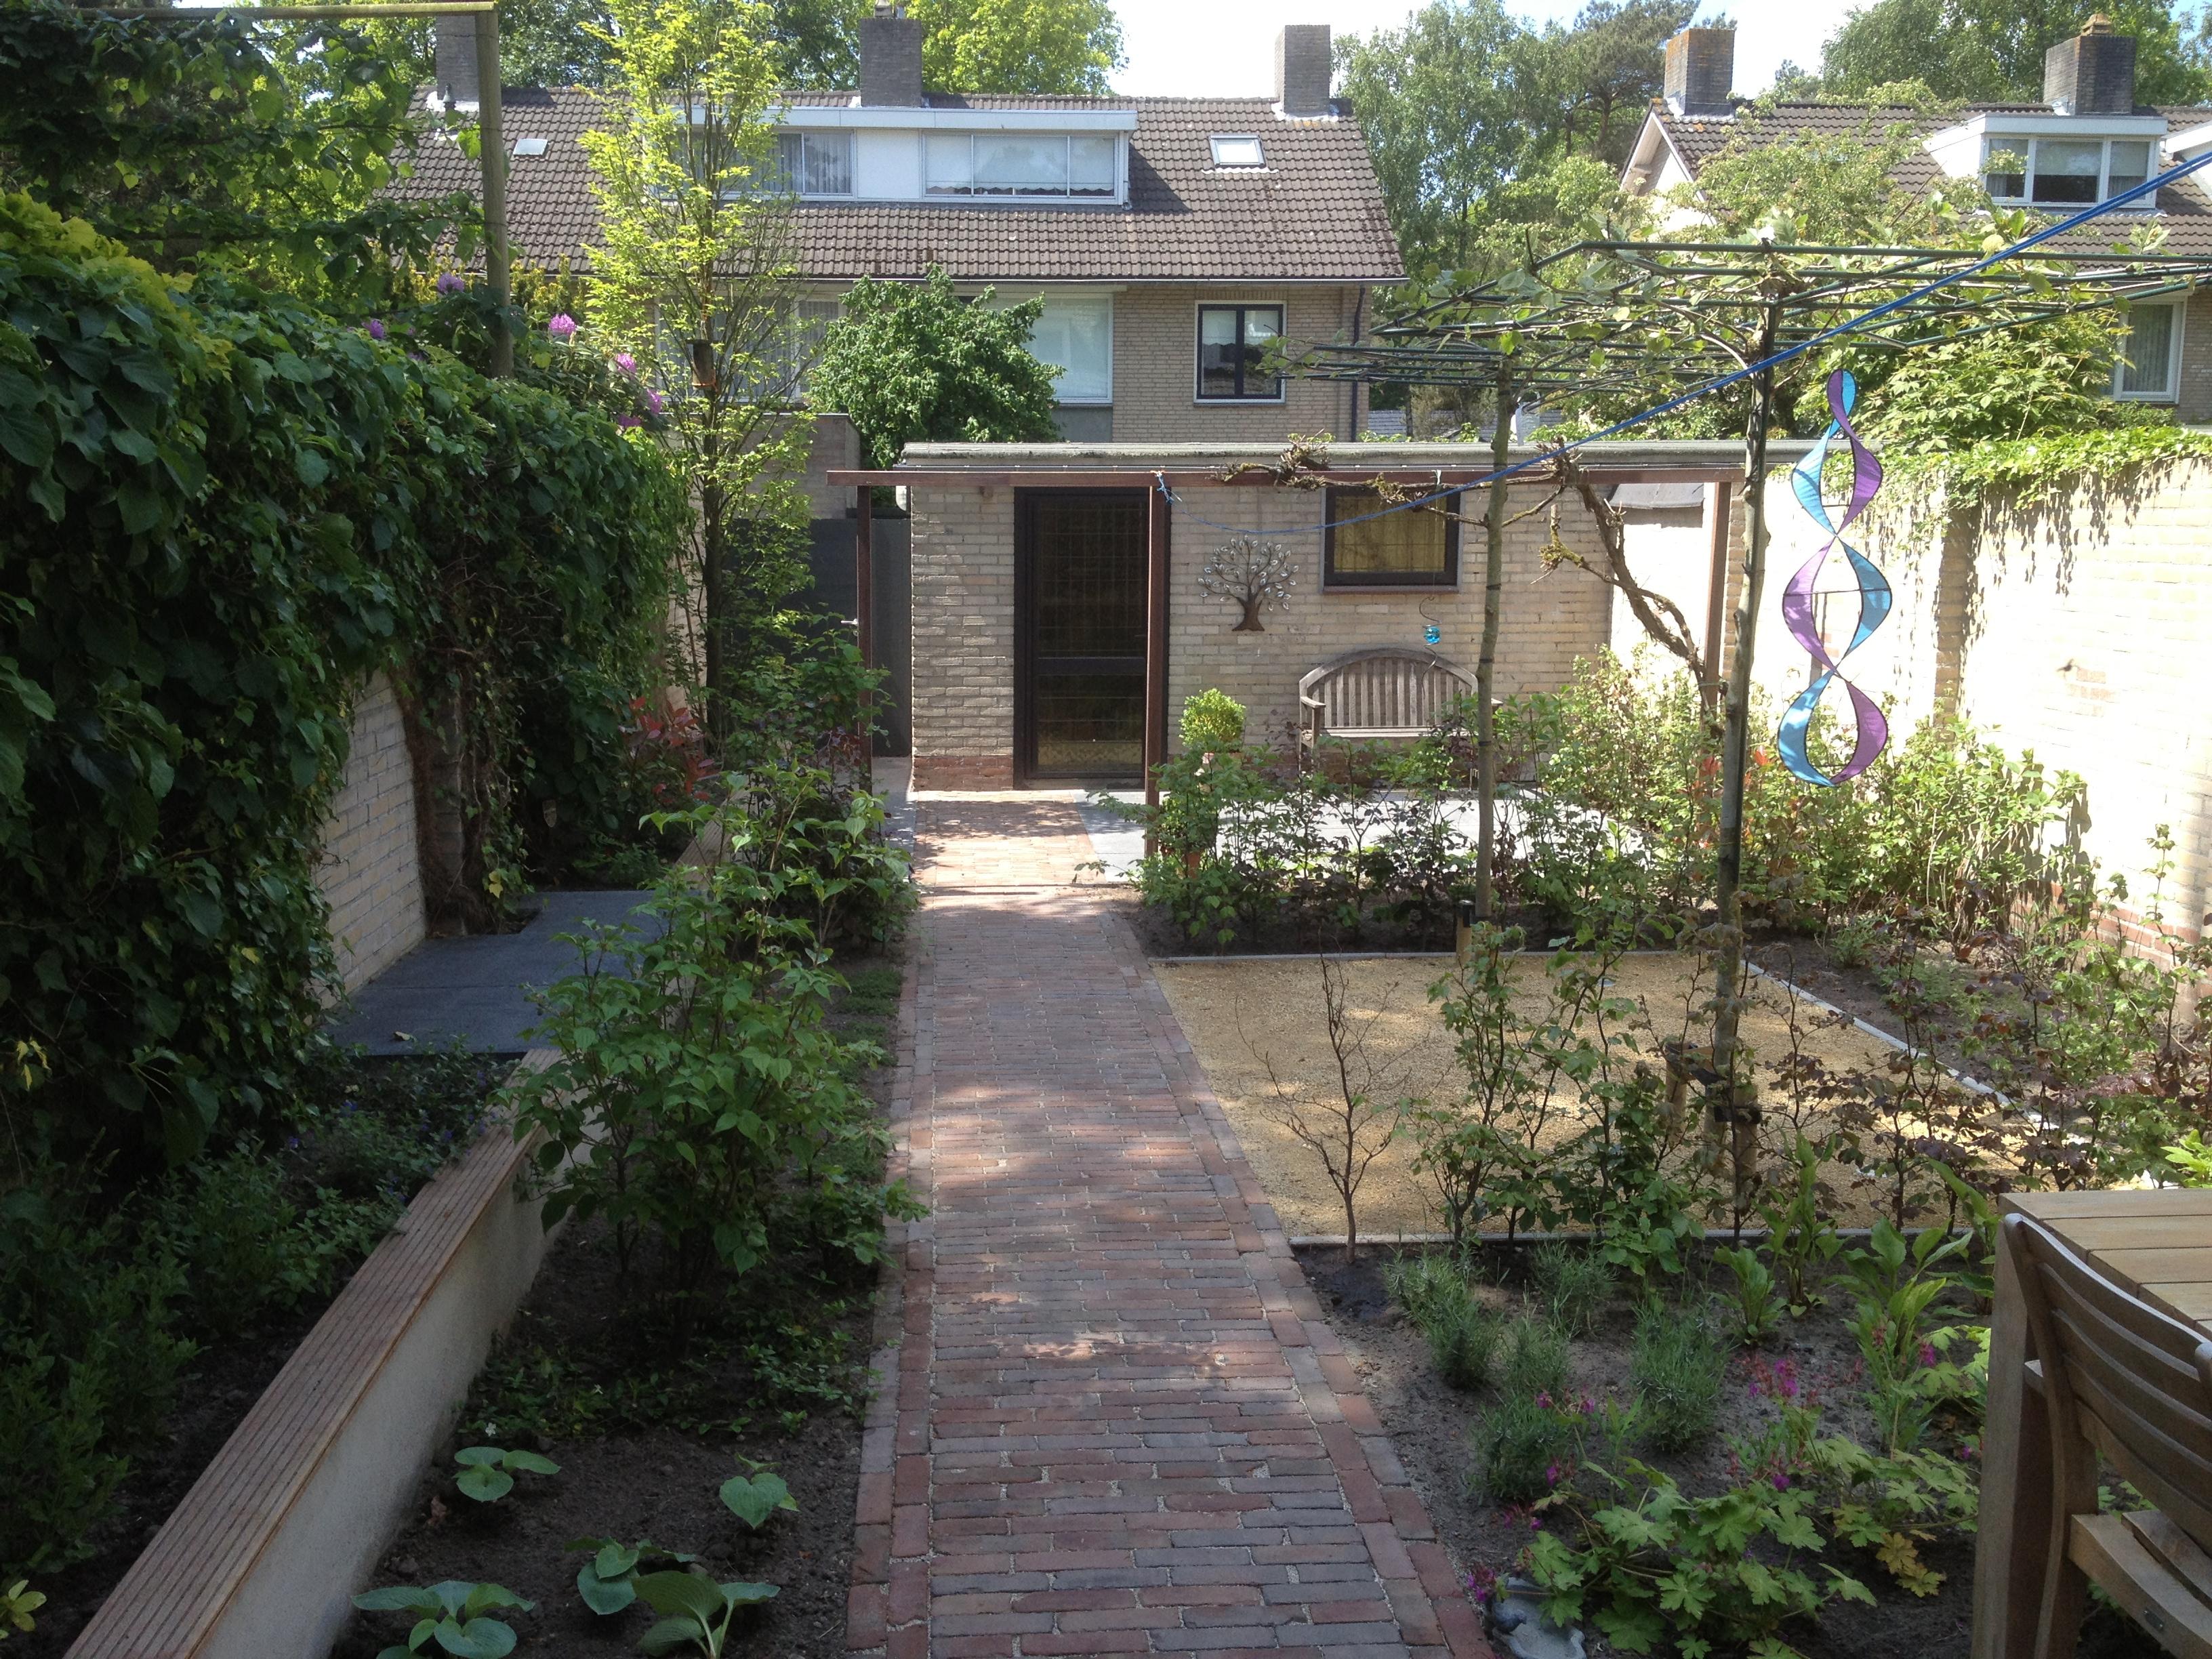 Tuinontwerp stiptop tuinen for Ontwerp tuin